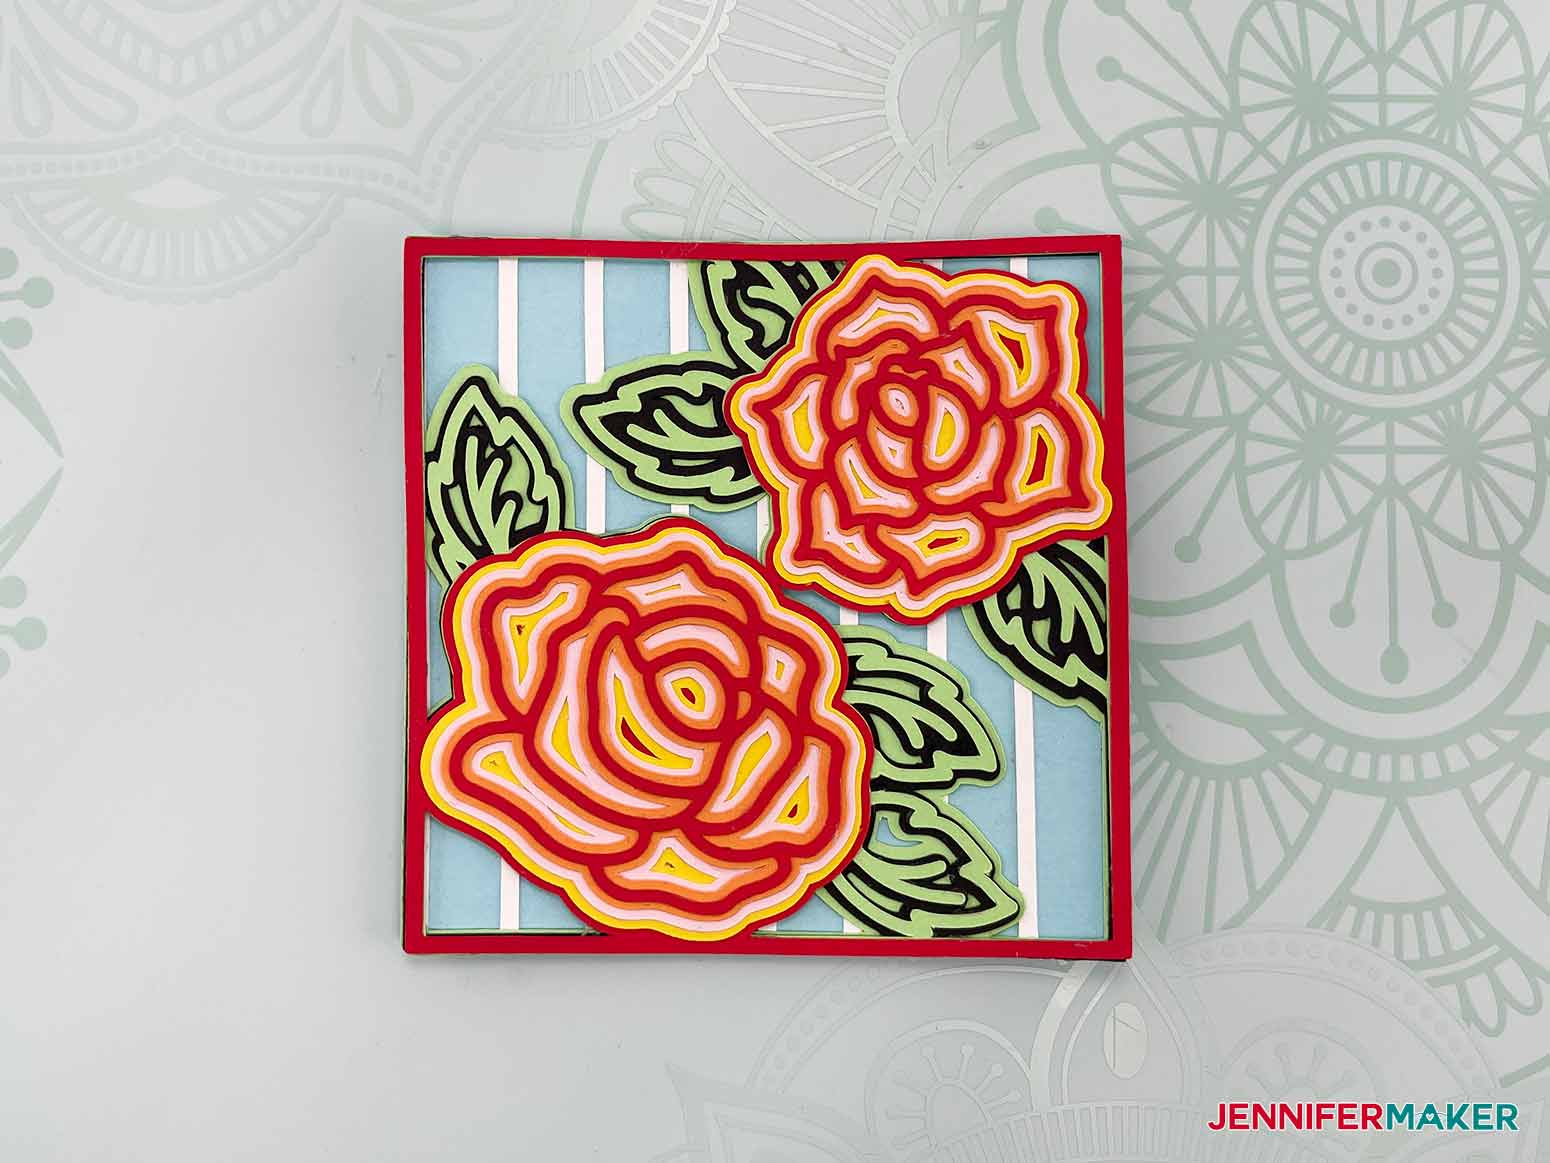 This is what my Layered Mandala Rose 3D design looks like cit on a Cricut Joy